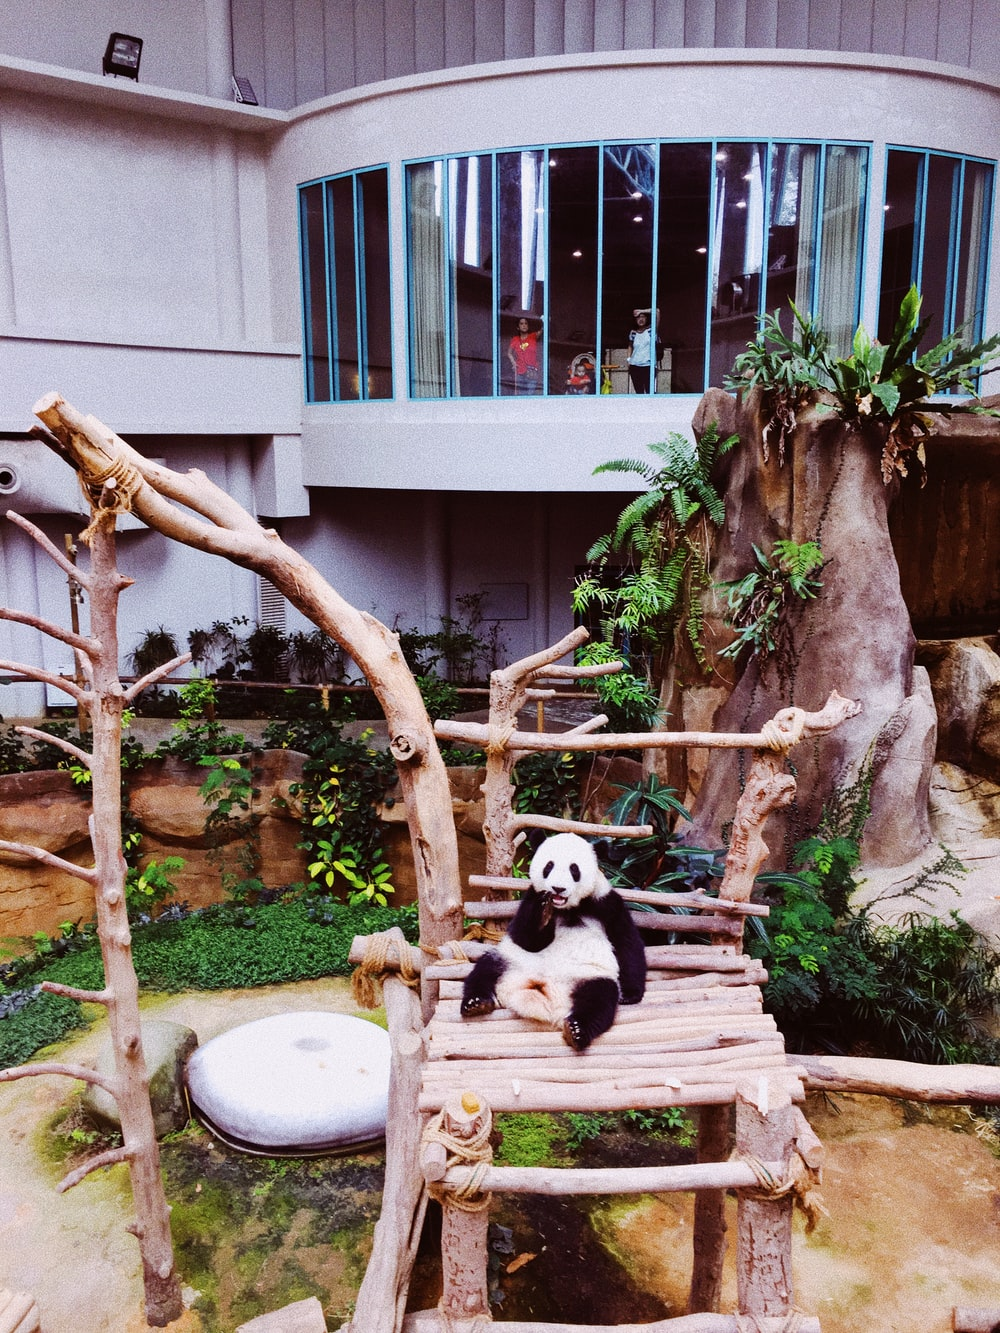 panda cub on wooden chair